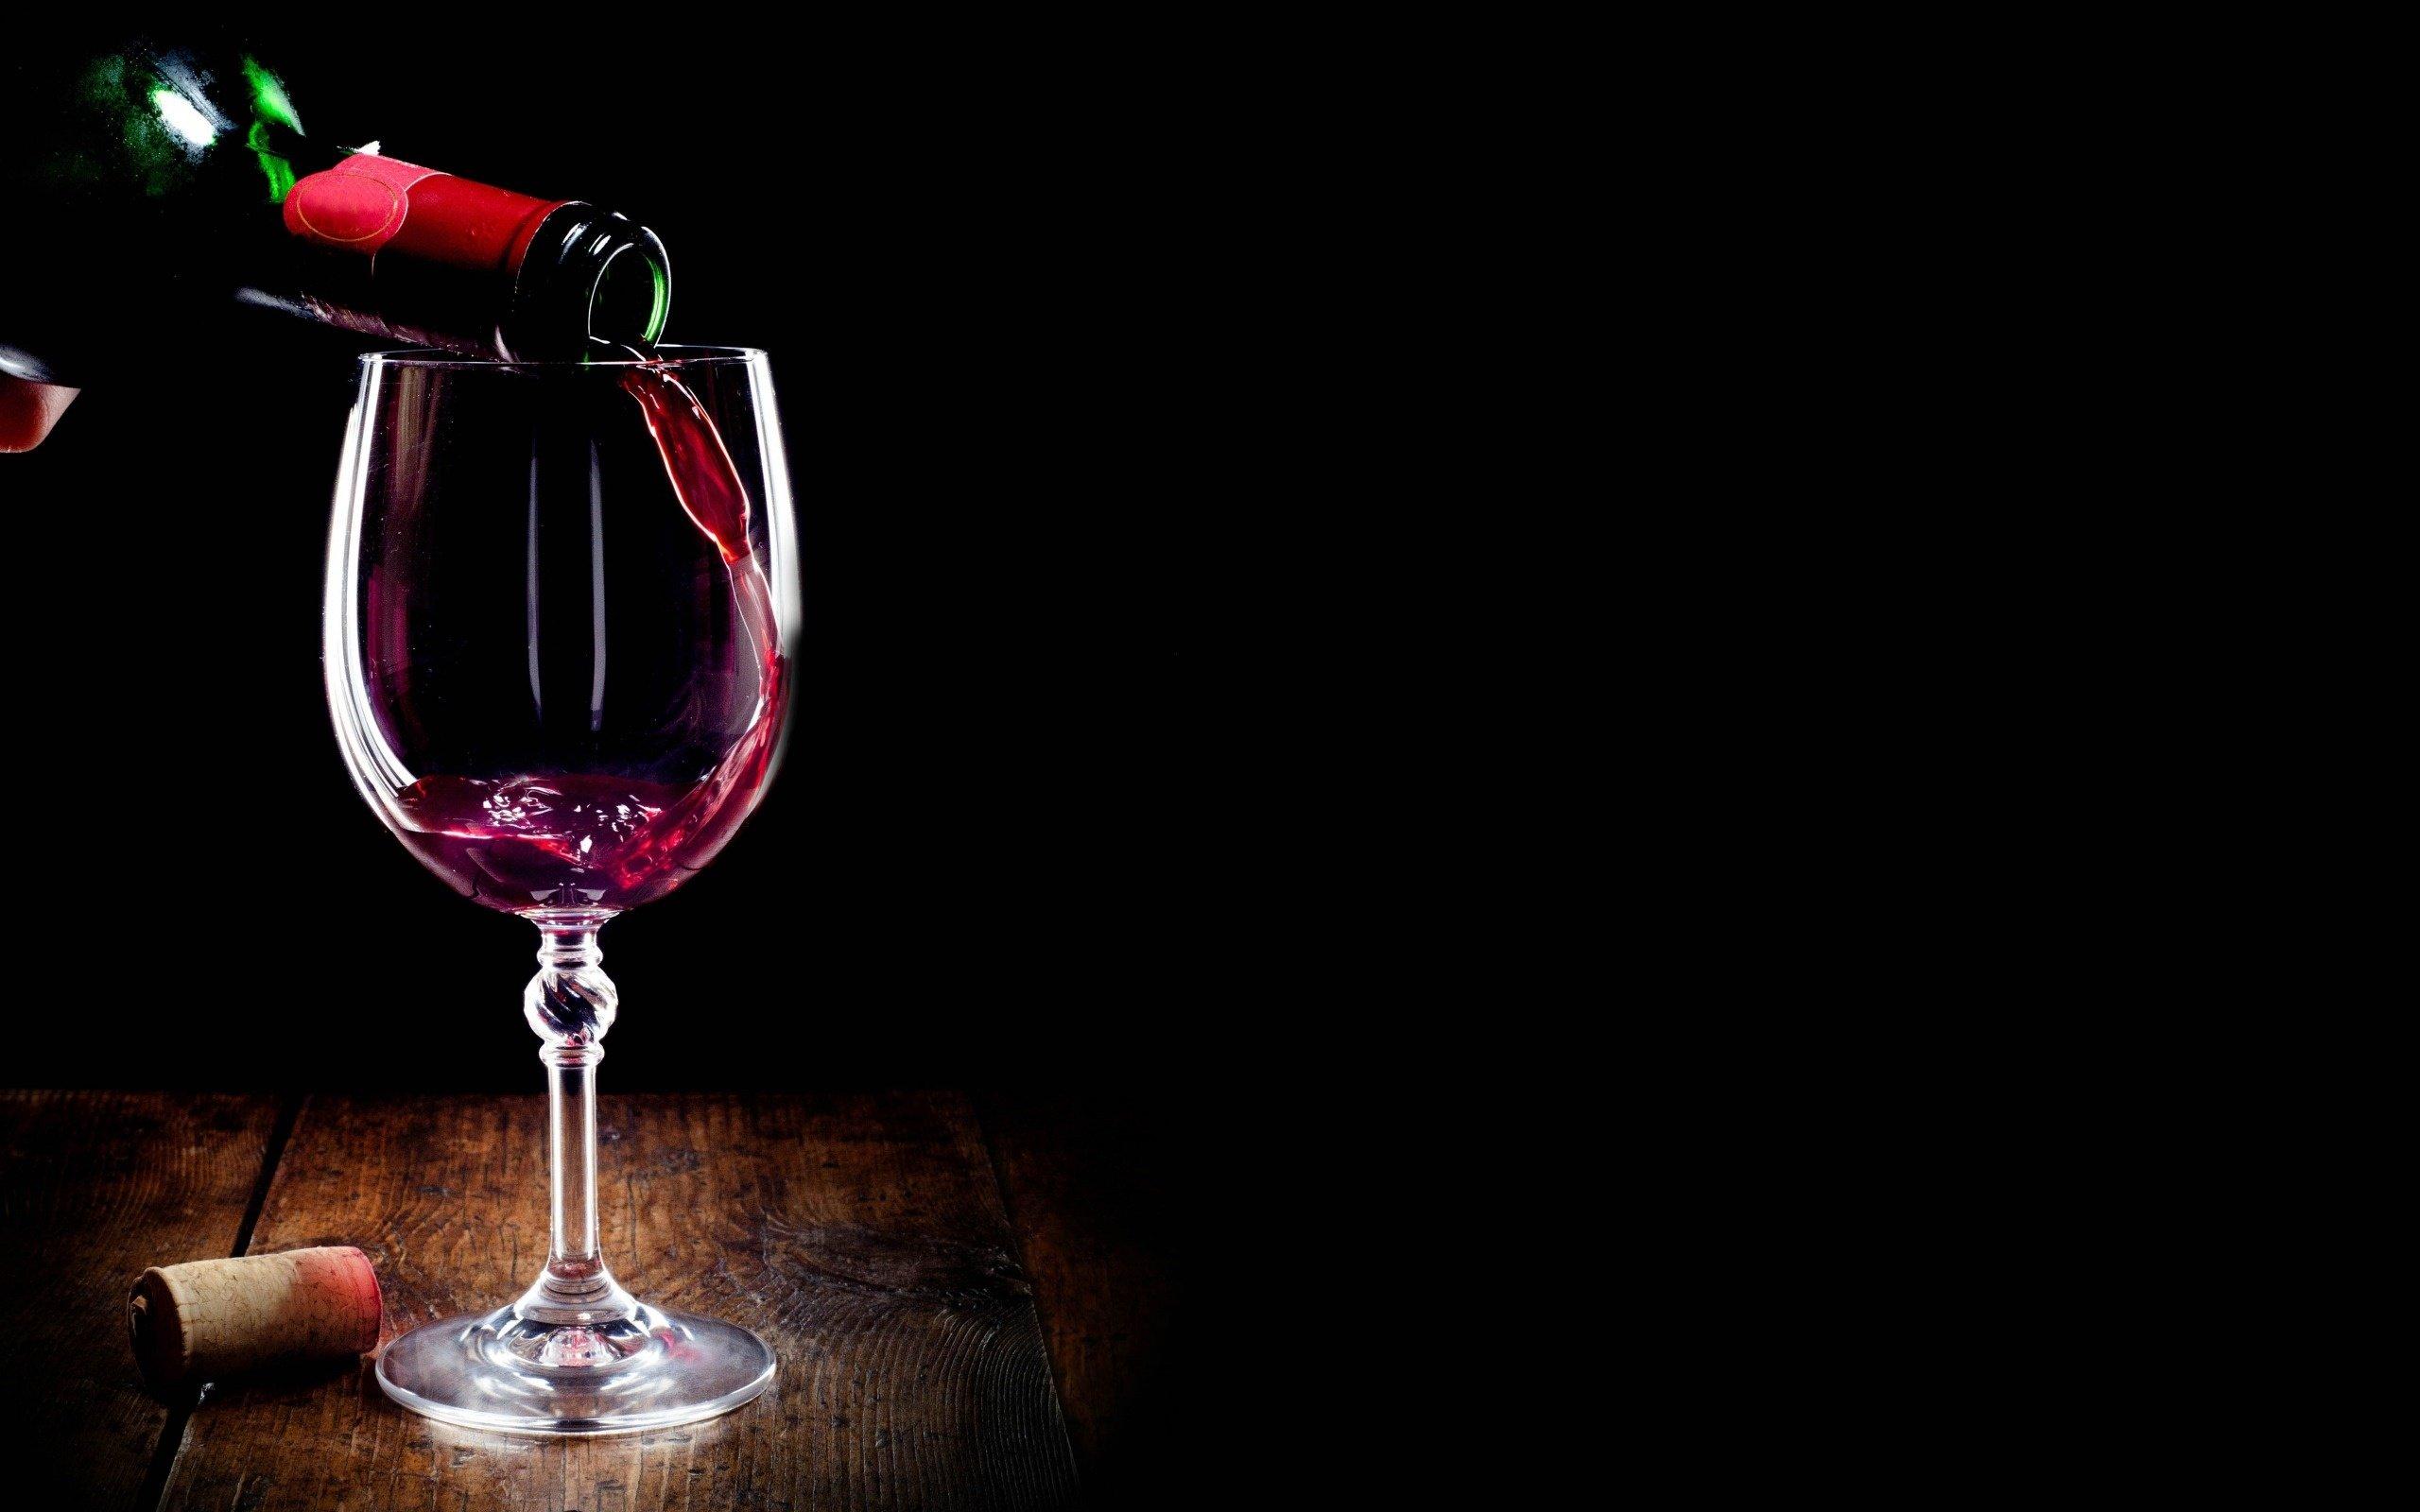 wallpaper wine red bottle - photo #36